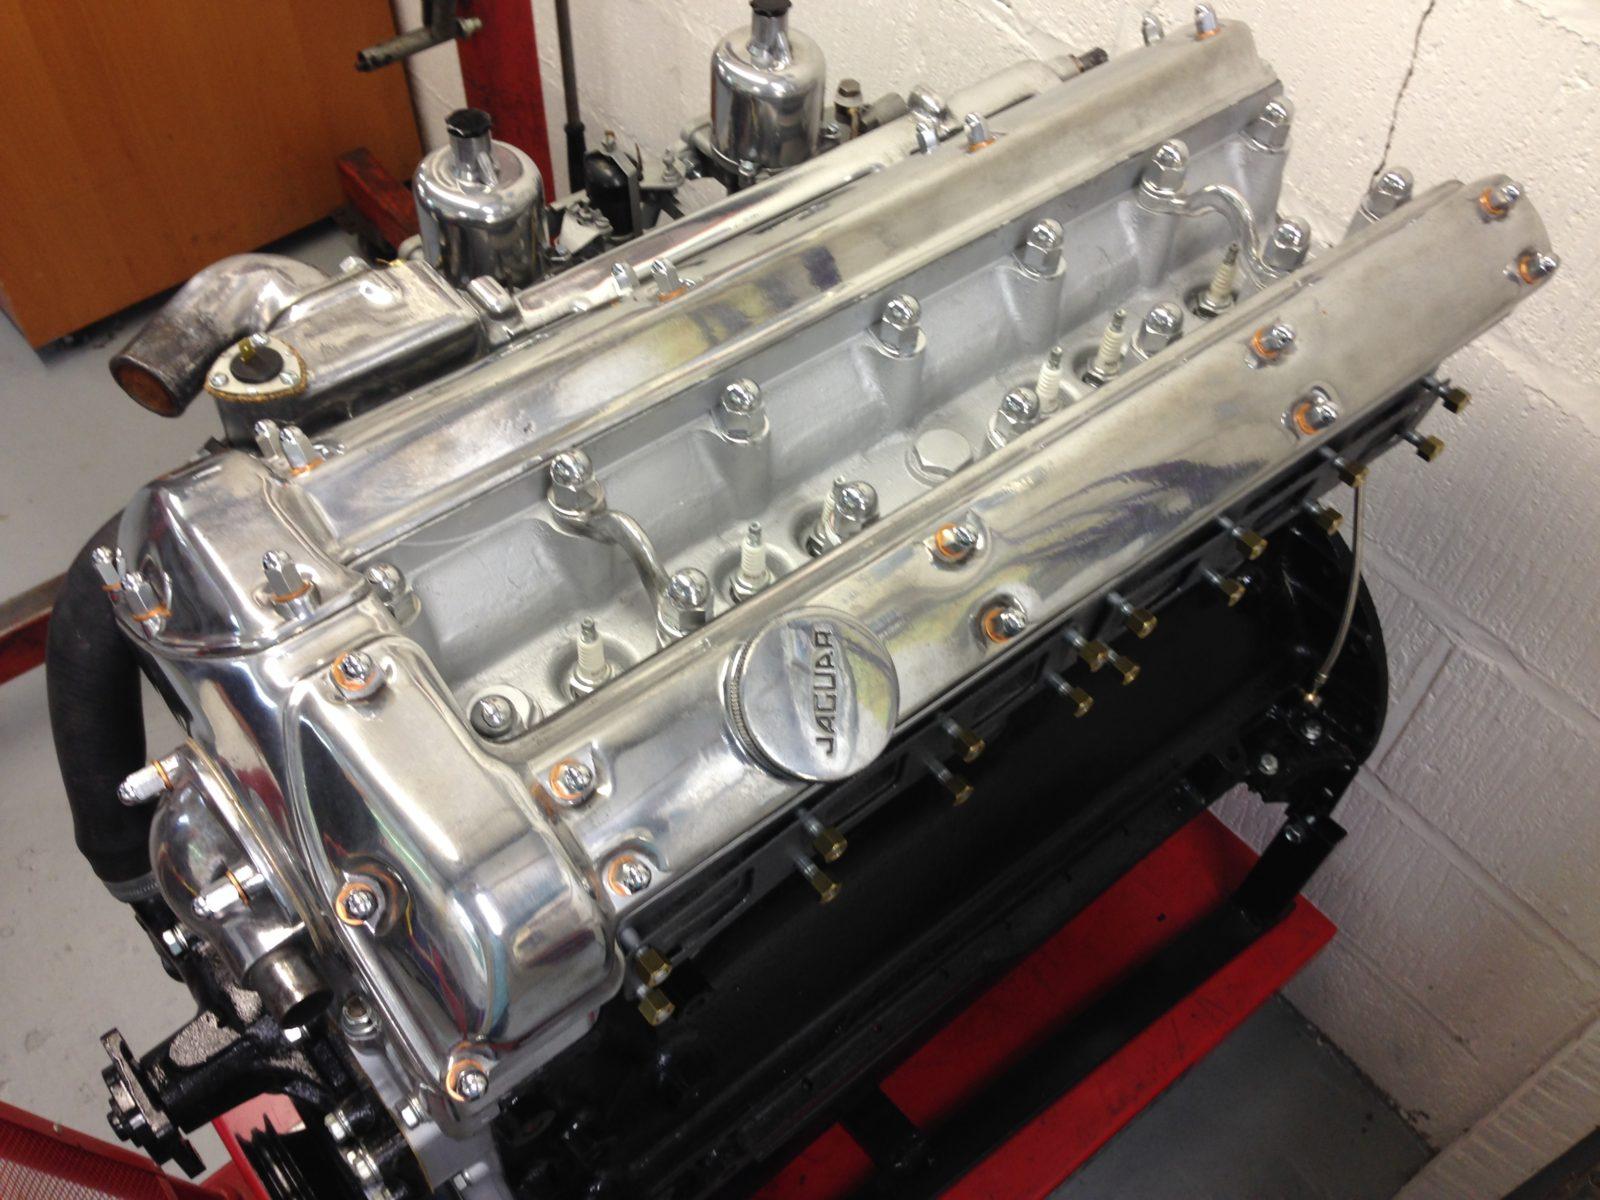 Jaguar 3.4l Engine for sale - ancillaries optional